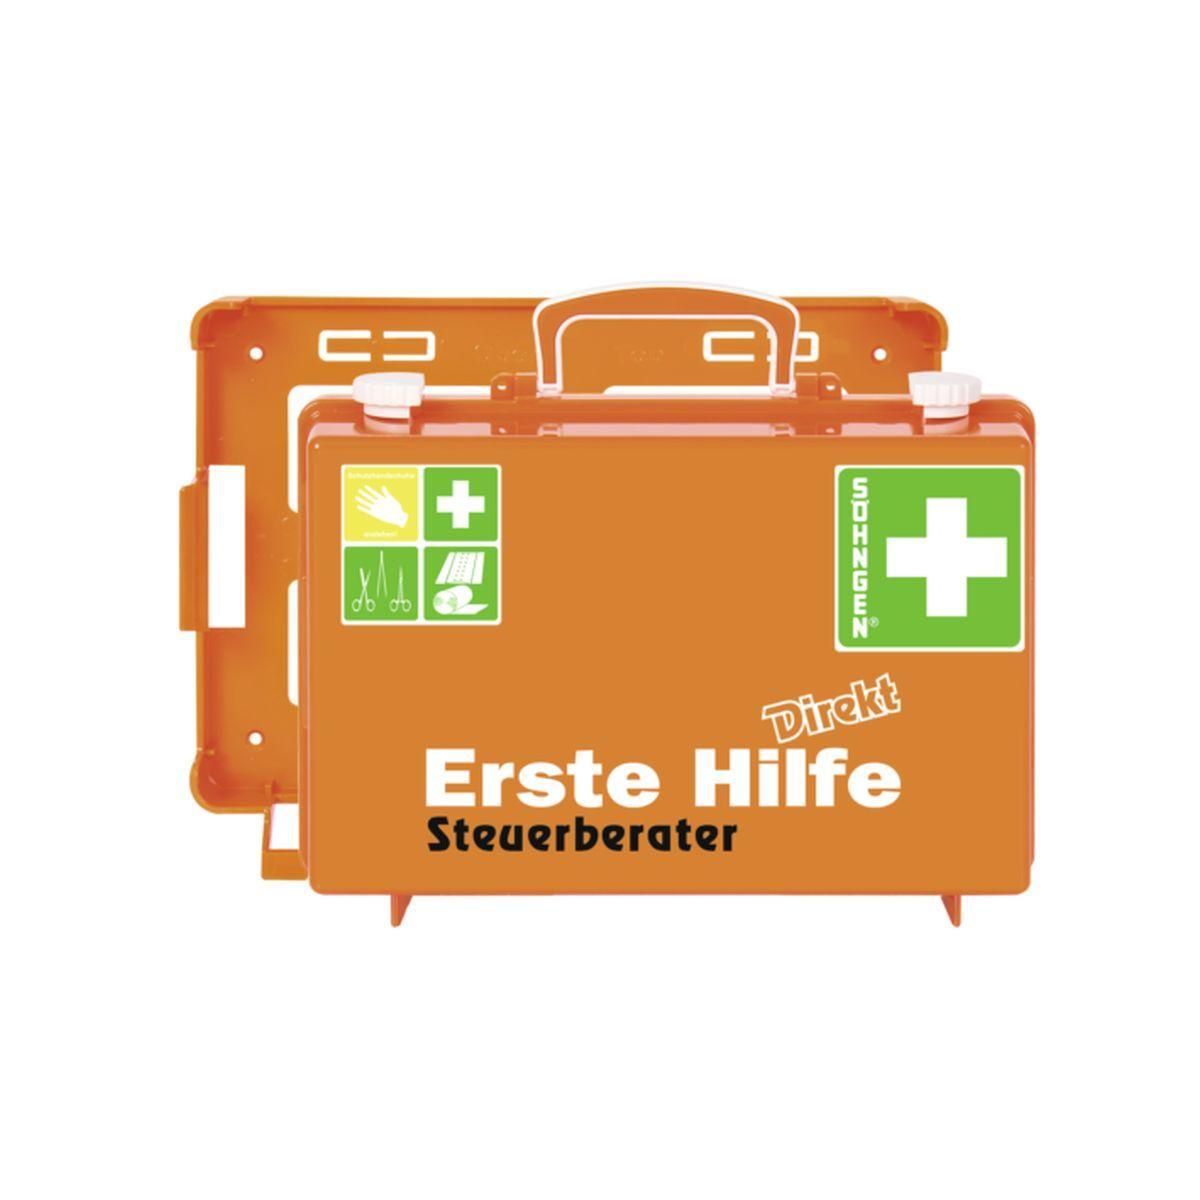 Erste Hilfe Koffer DIN 13157 DIREKT, Steuerberater